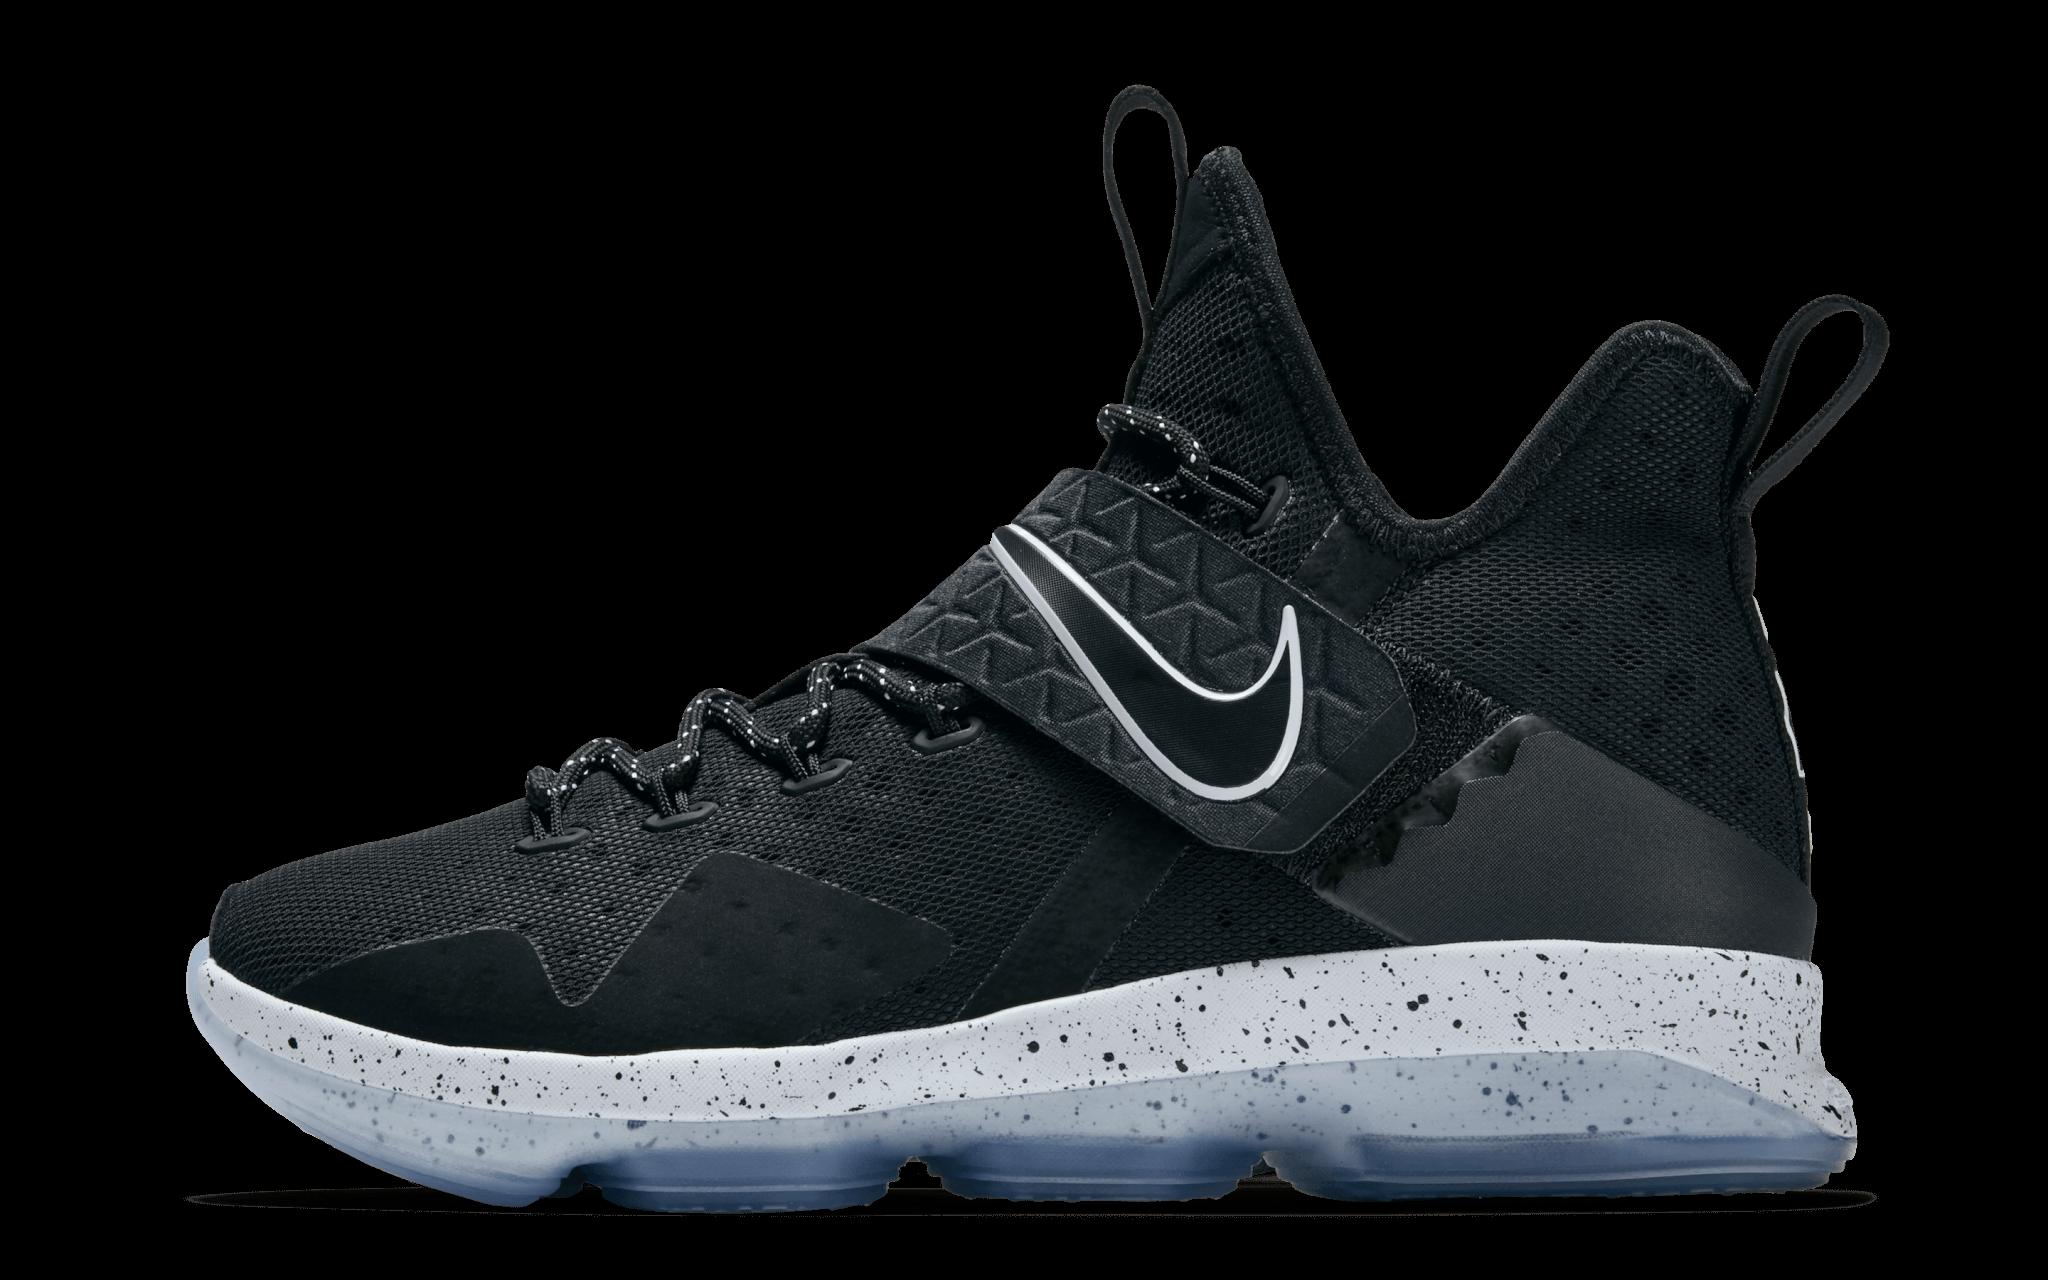 quality design c5638 d2344 Nike Lebron 14 Review